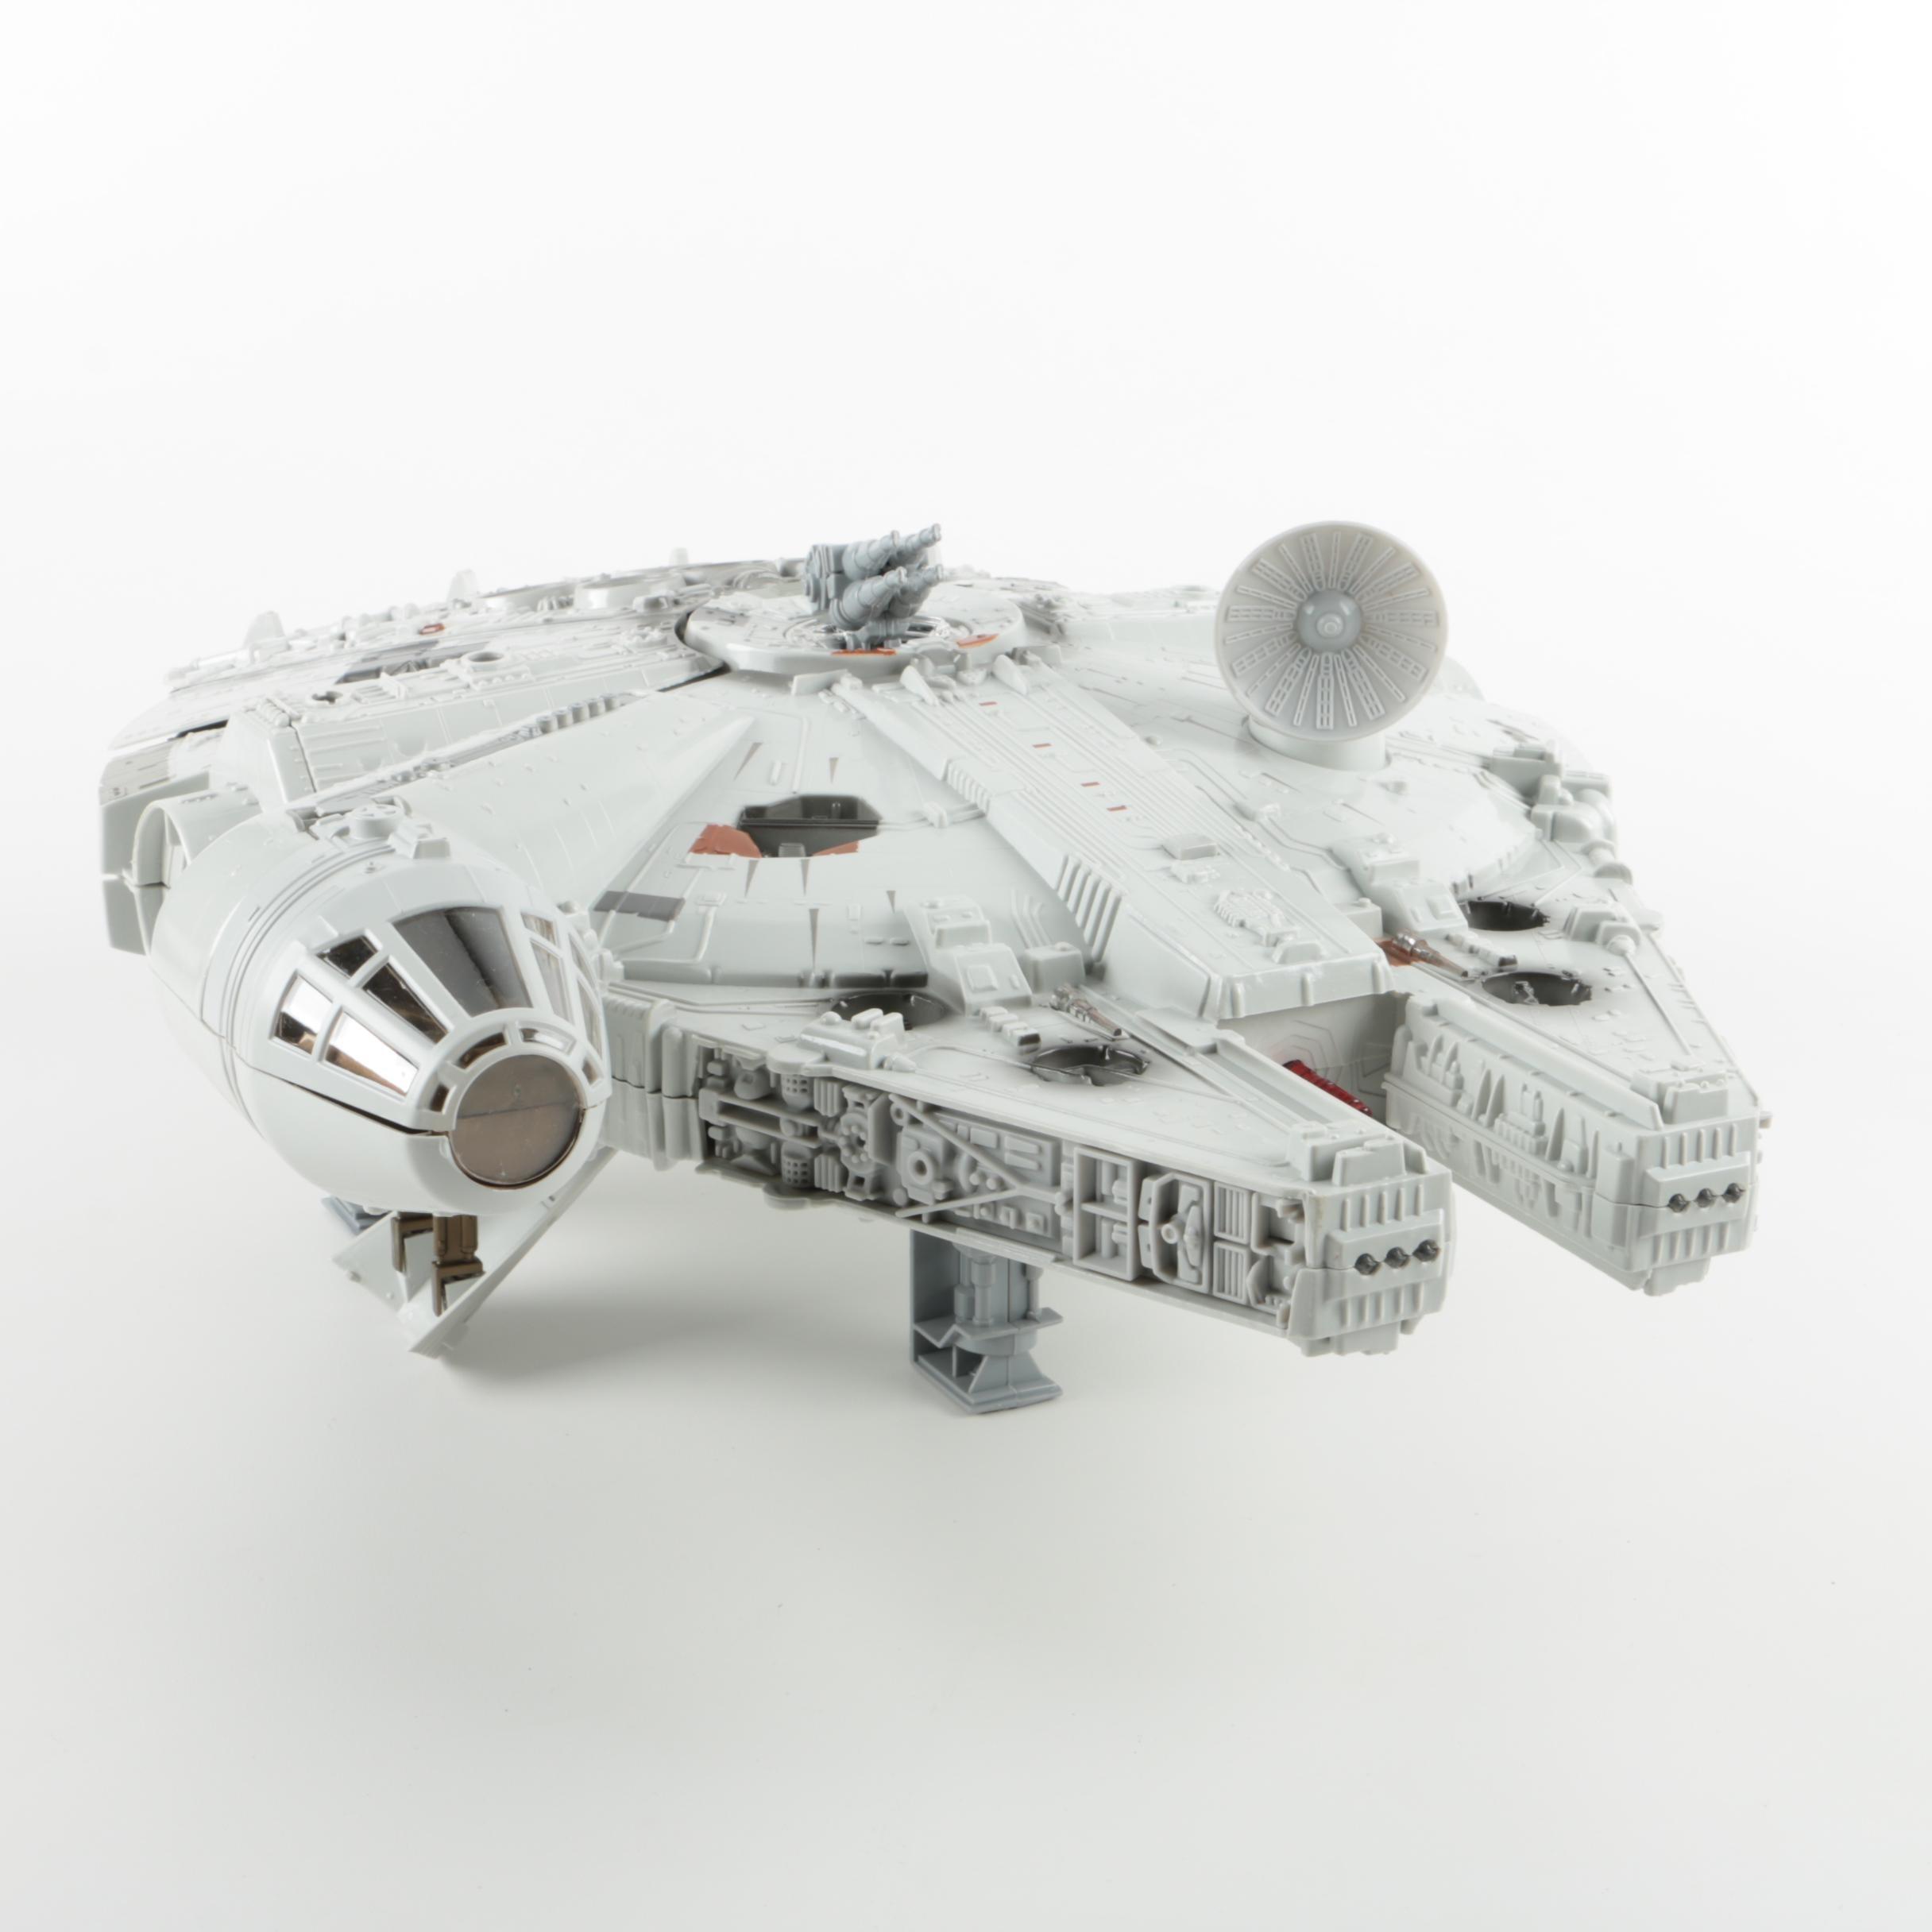 "2005 ""Star Wars"" Millennium Falcon"